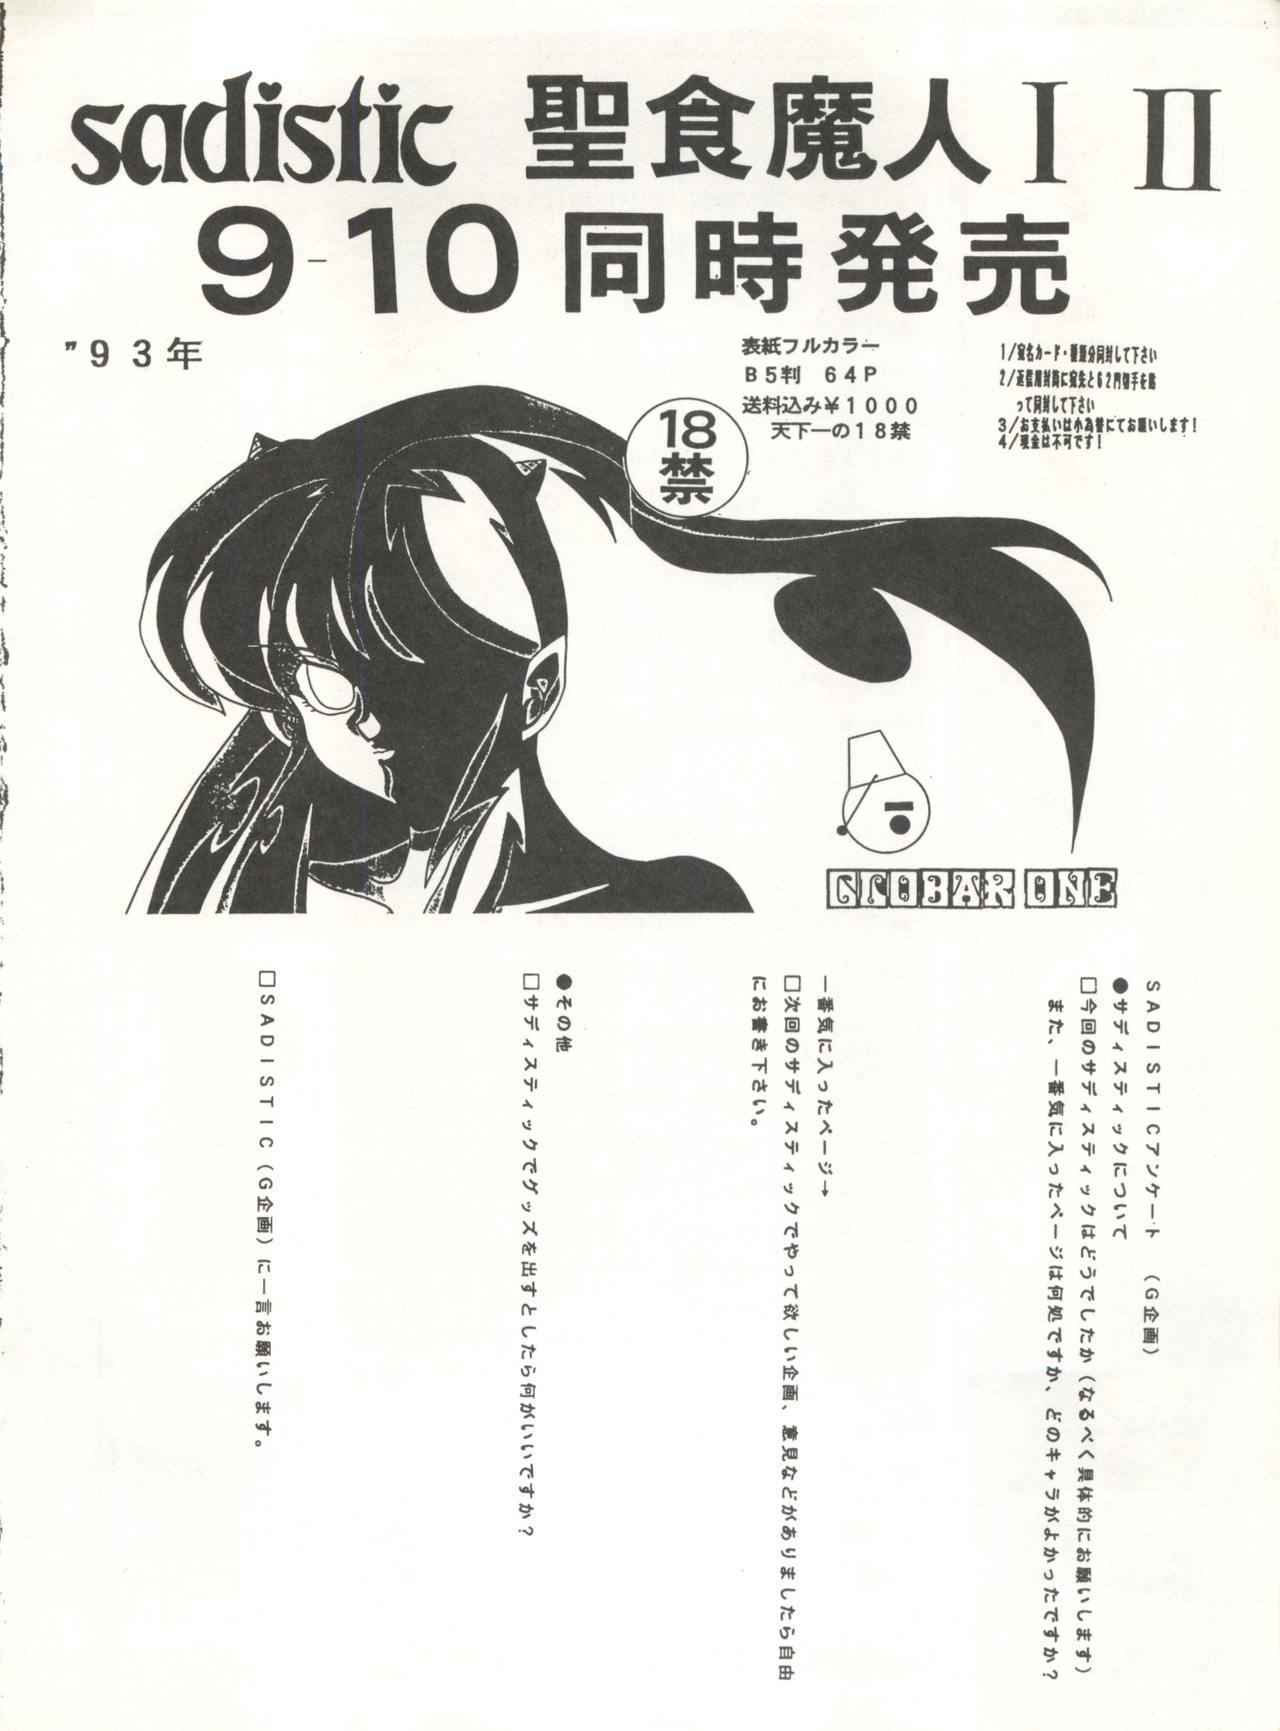 [Global One (MARO)] Sadistic 5 (Cutey Honey, Devilman, Sailor Moon), [Global One (MARO)] Sadistic (Dirty Pair, Fushigi no Umi no Nadia, Sailor Moon), [Studio Ikkatsumajin] .ribbon (Hime-chan's Ribbon) 123